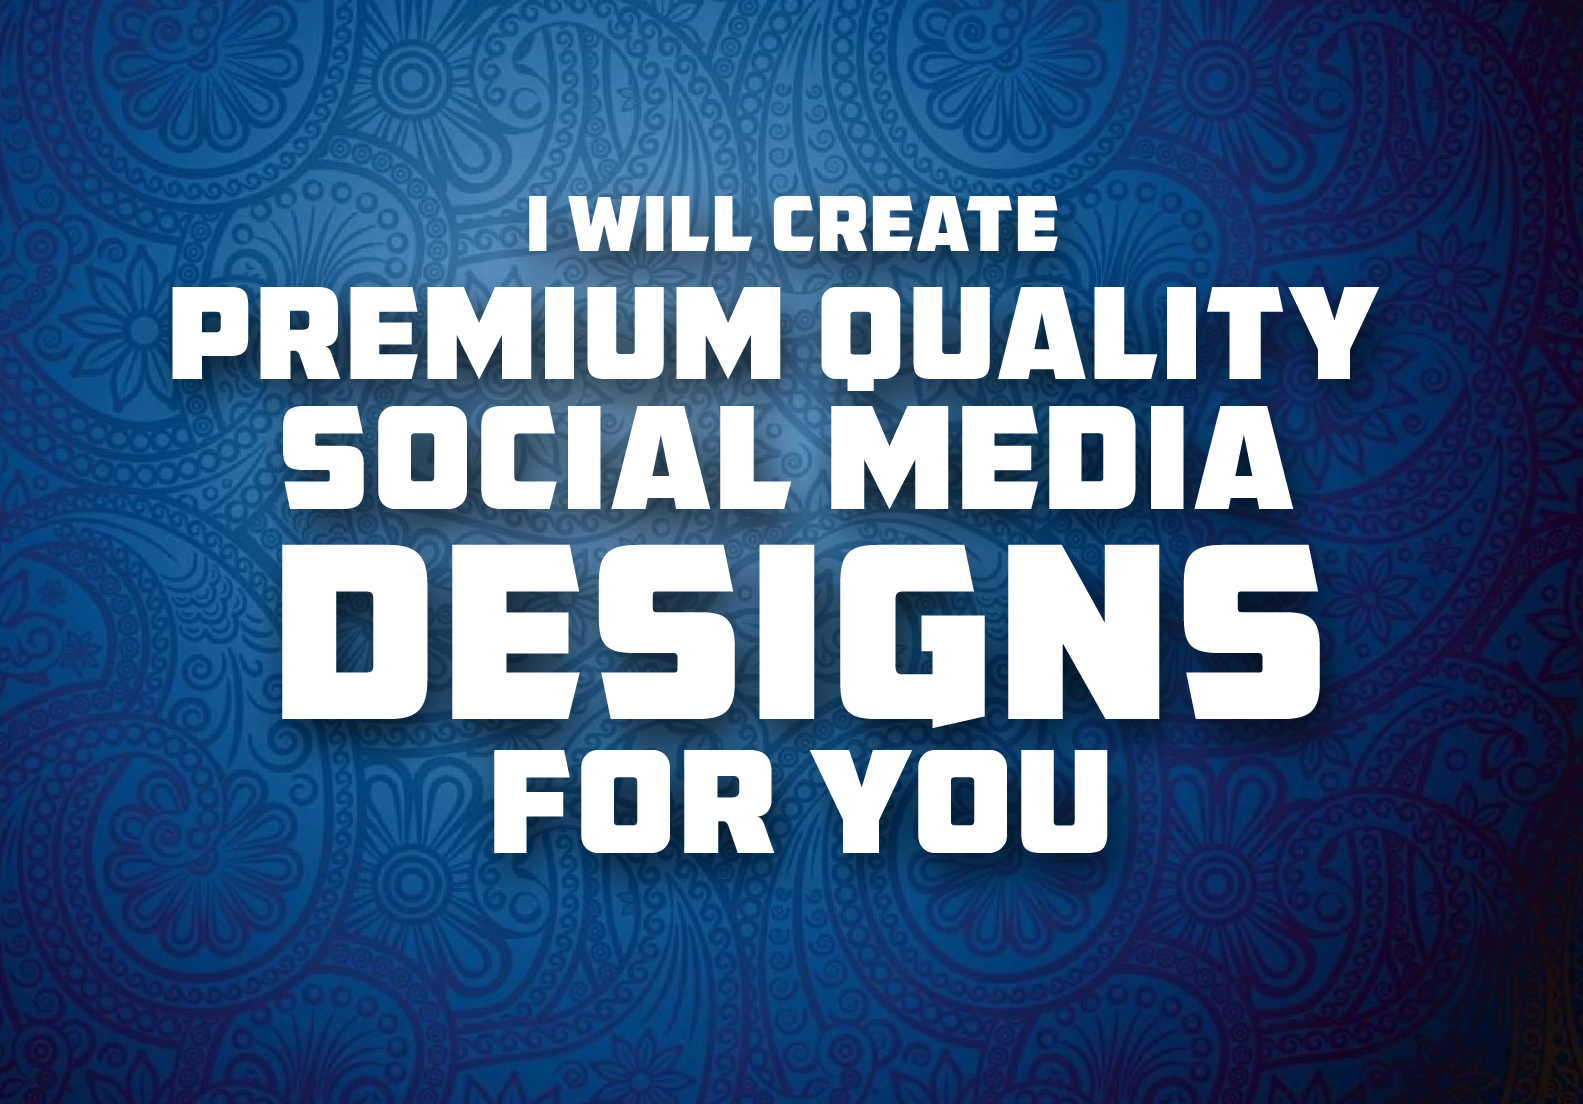 I will create premium quality social media designs for you